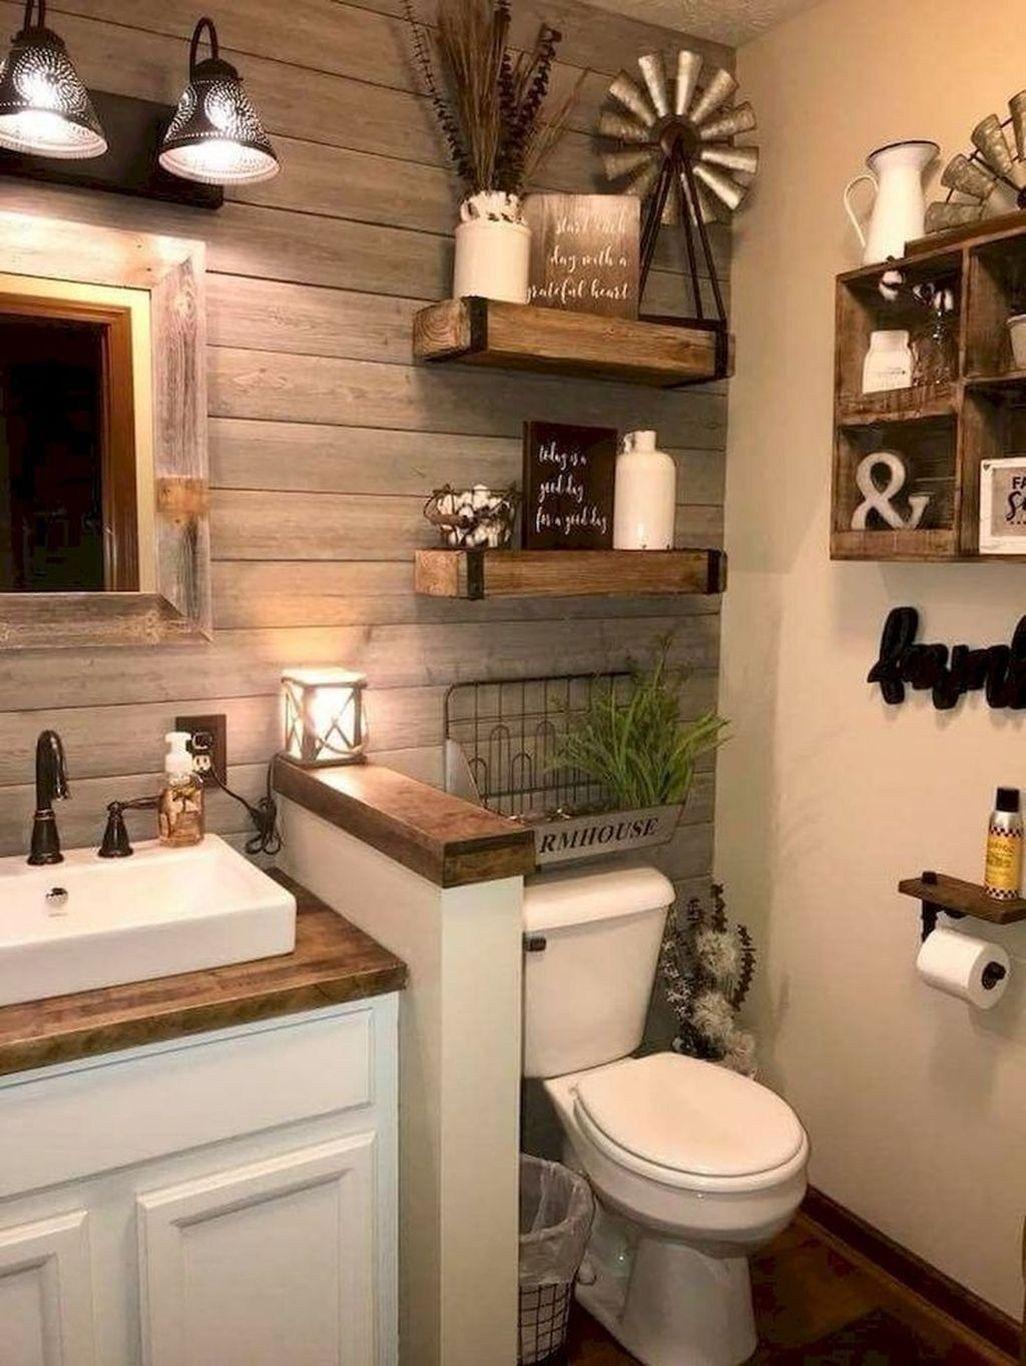 41 Unique Rustic Home Diy Decor Ideas (With images